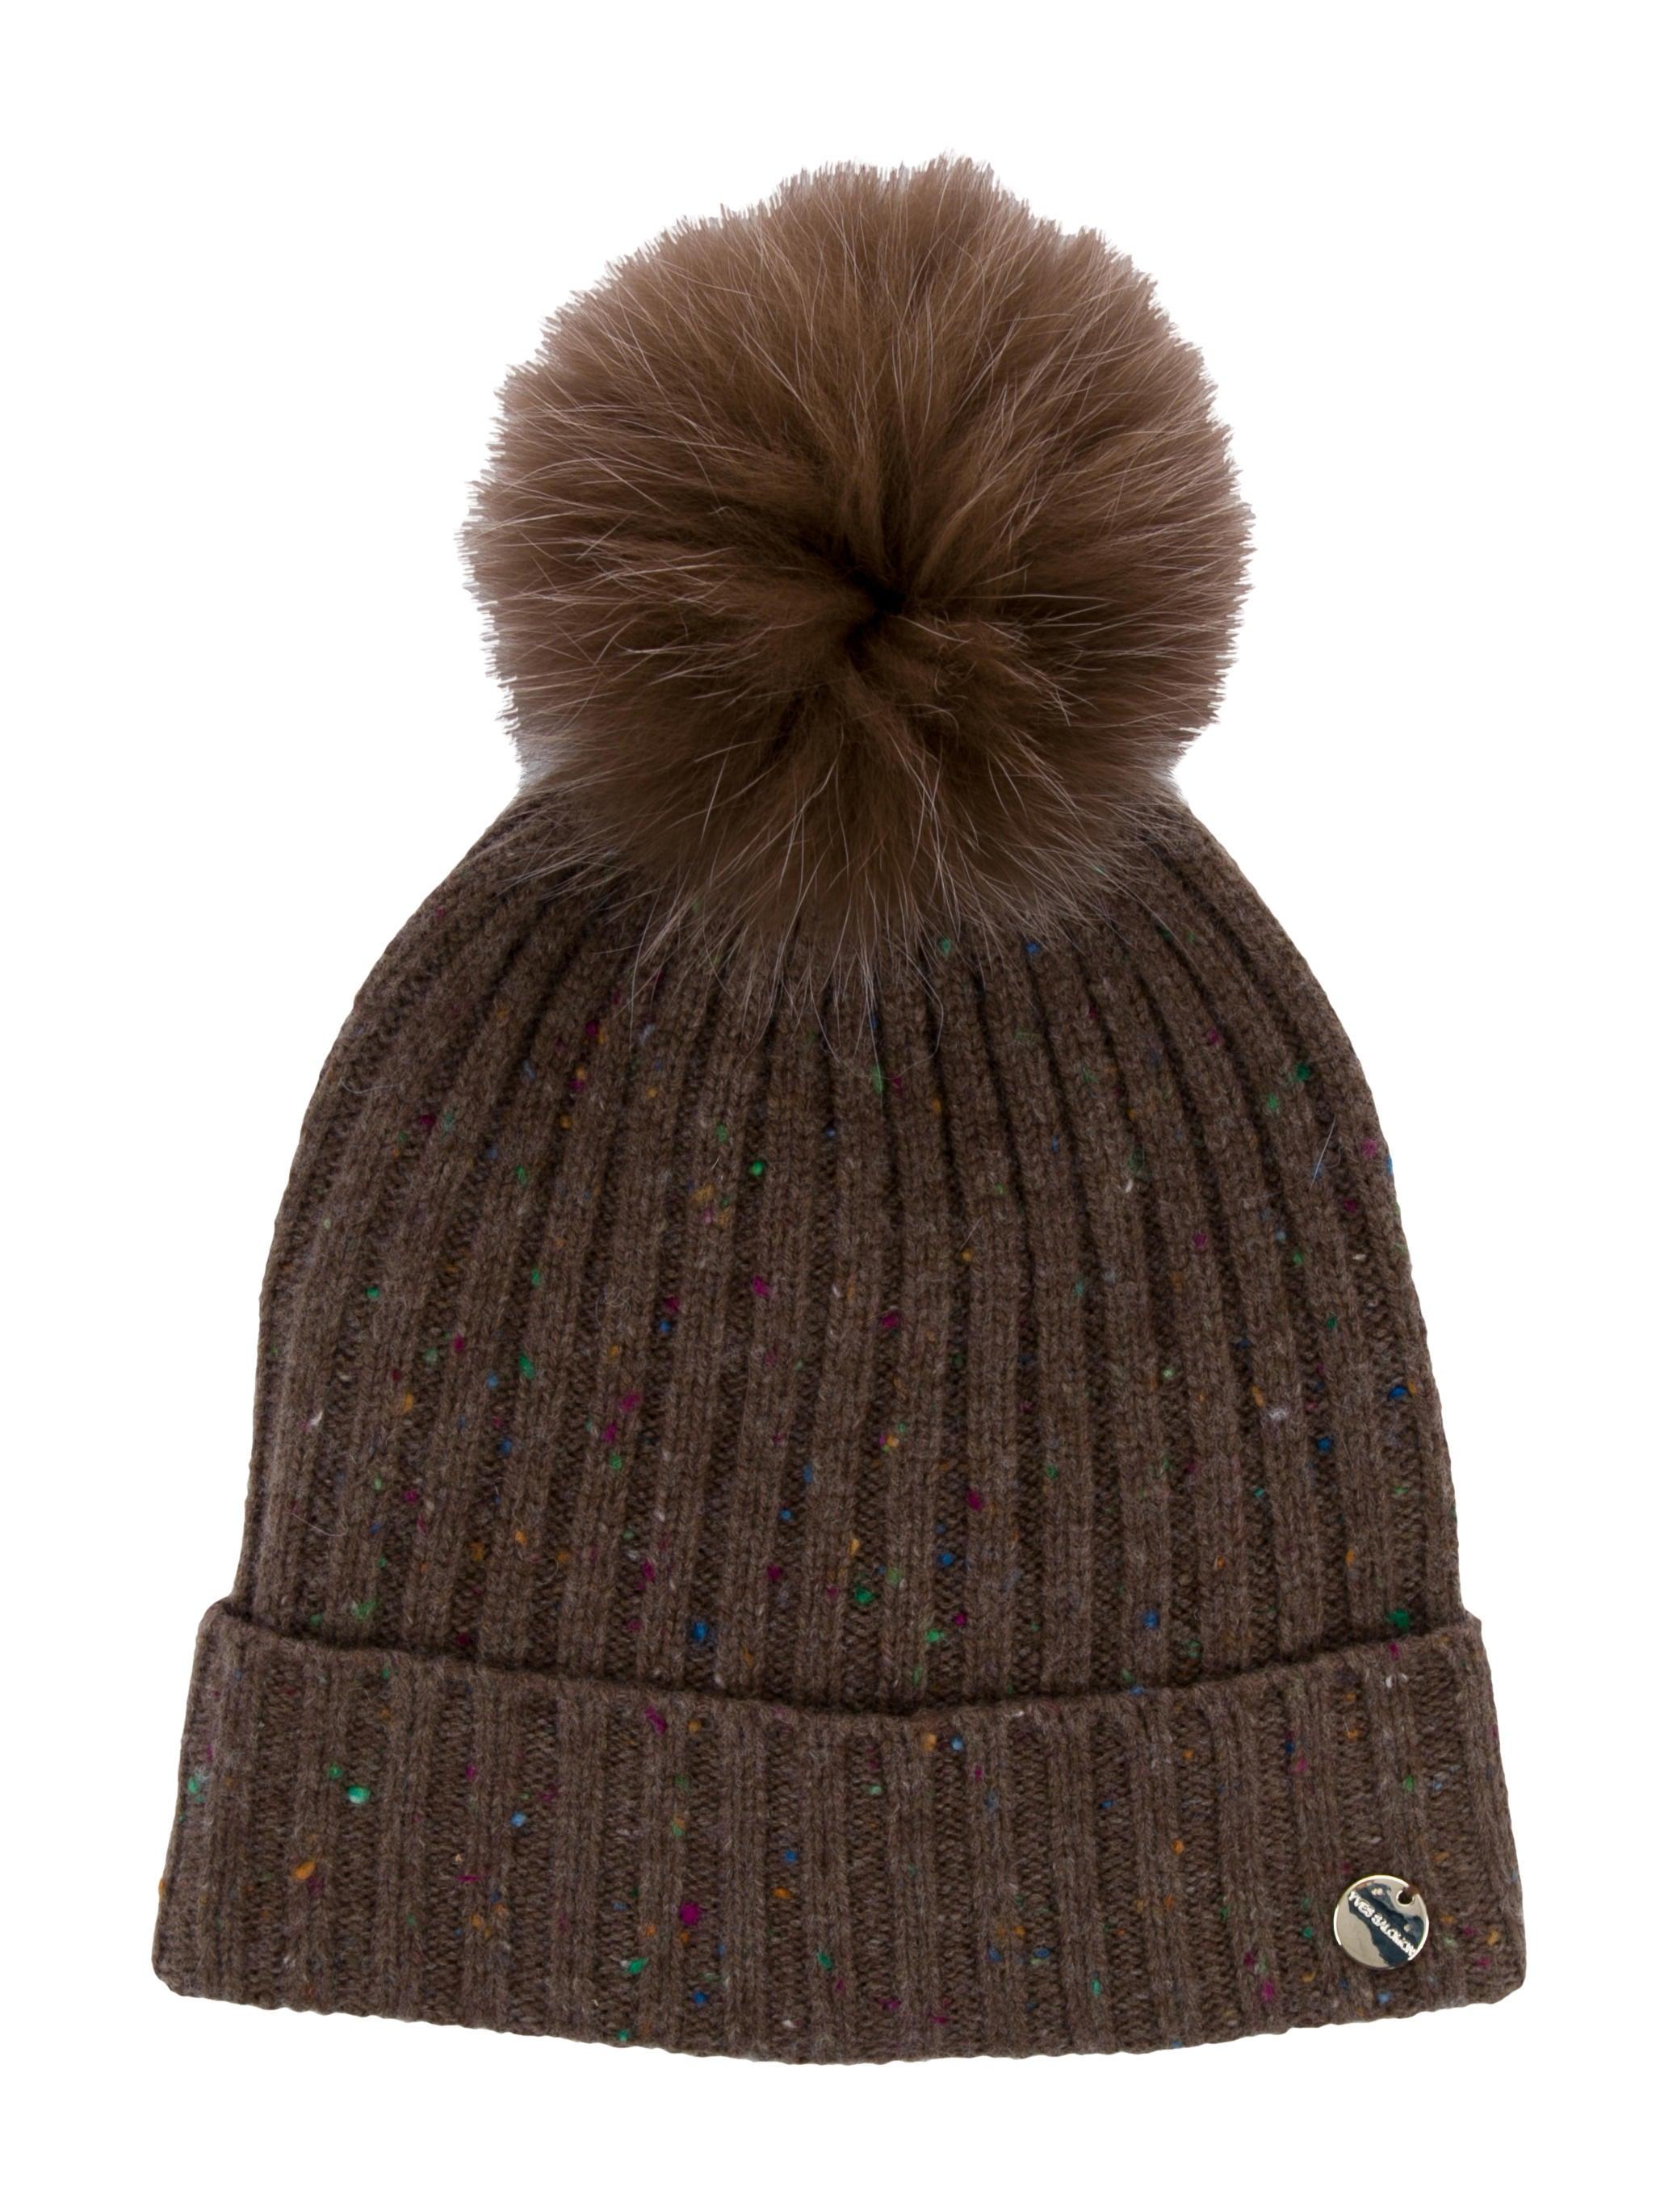 Yves Salomon Fox Fur Pom-Pom Beanie w  Tags - Accessories - YSN20752 ... 6dfc246d202